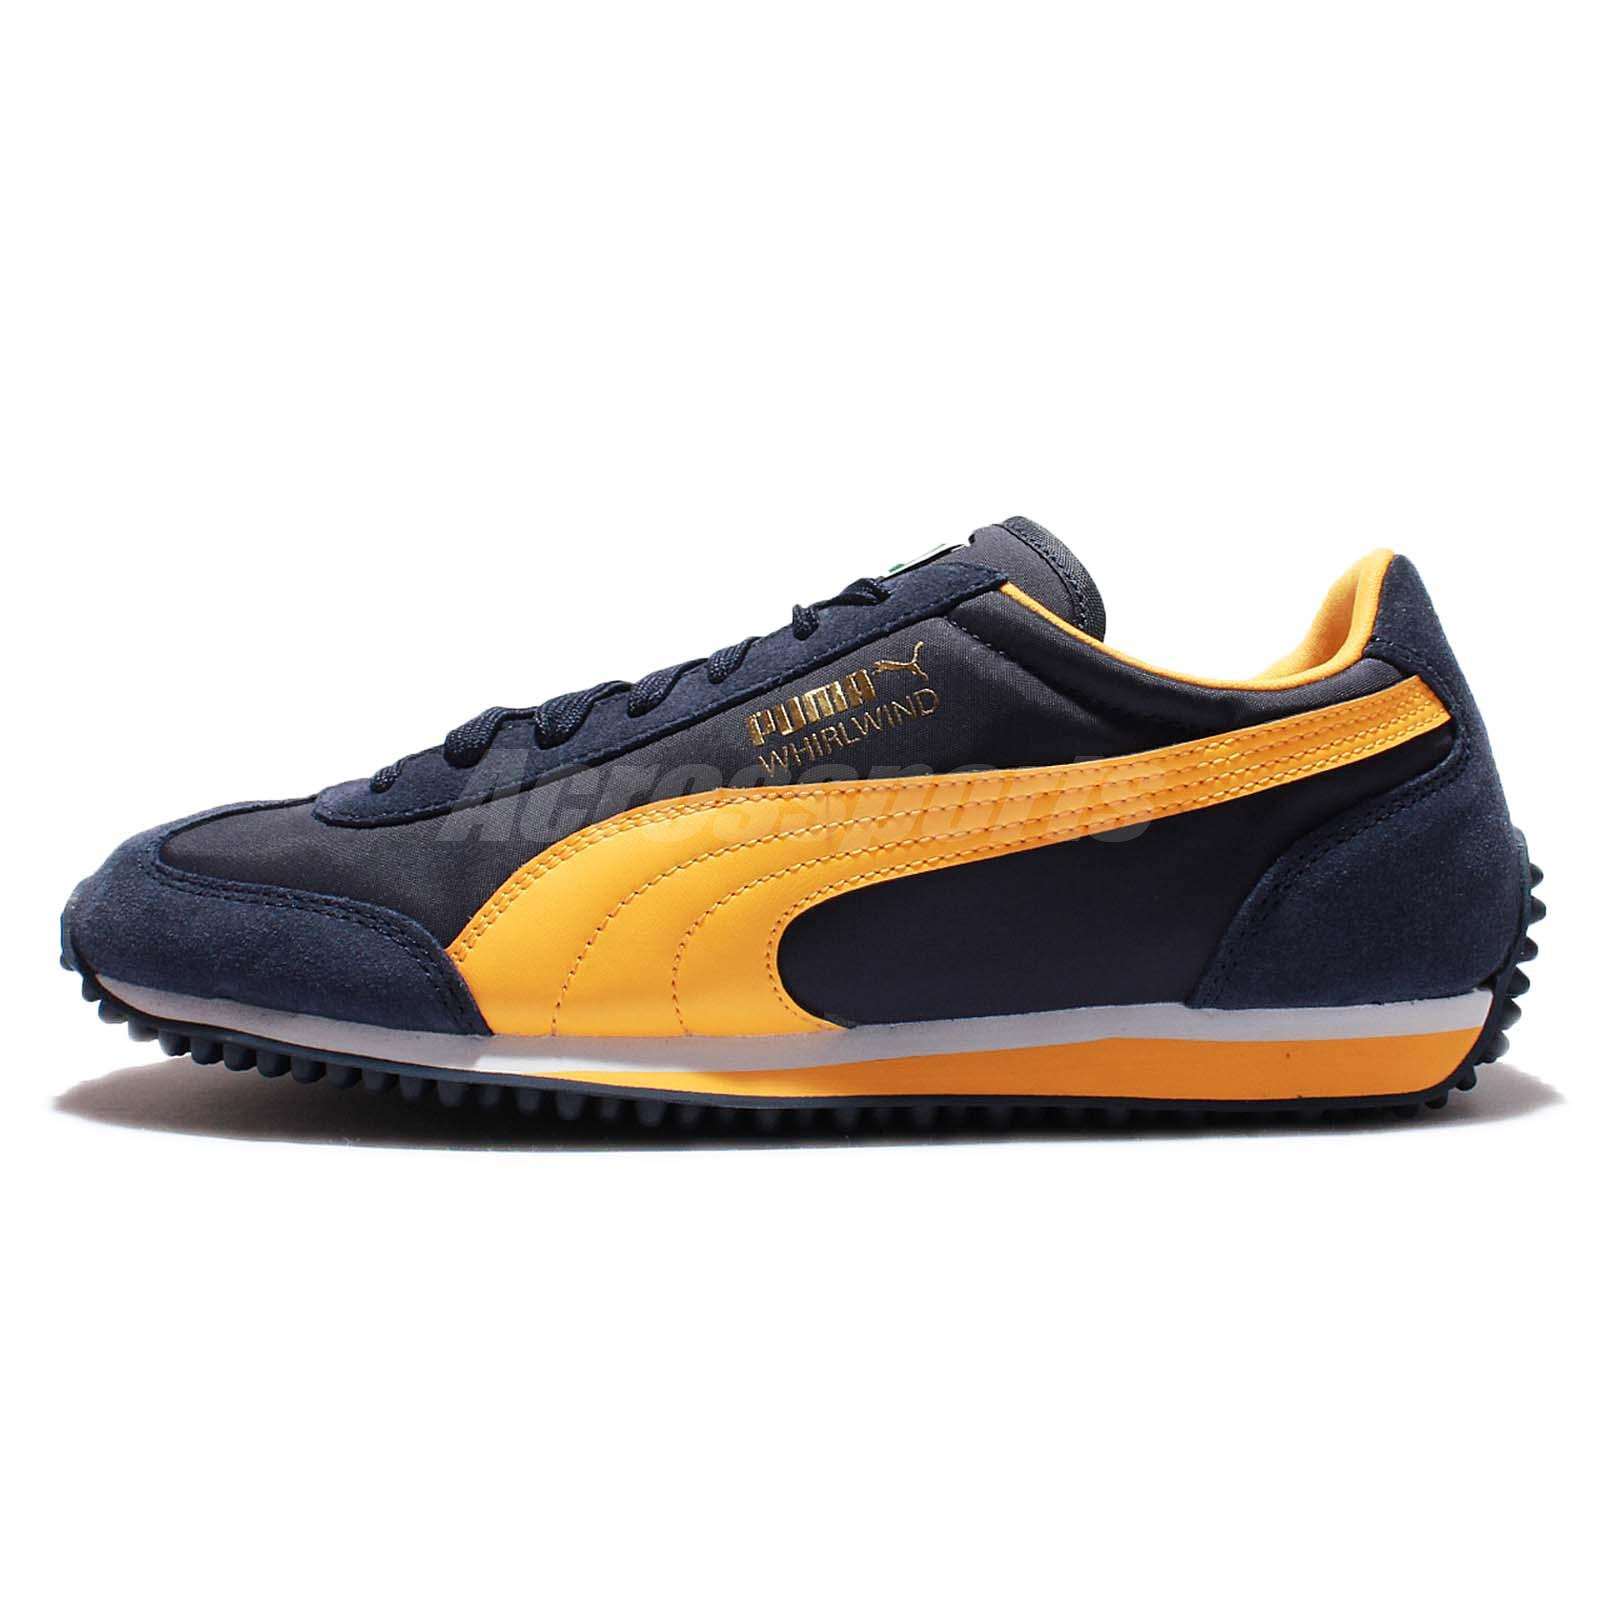 ... Blue White 1024x643 whirlwind puma Beige PUMA-Mens-Whirlwind-Classic-Sneaker  Puma Shoes Navy BlueGold Original Whirlwind Classic Lo ... 52770c624